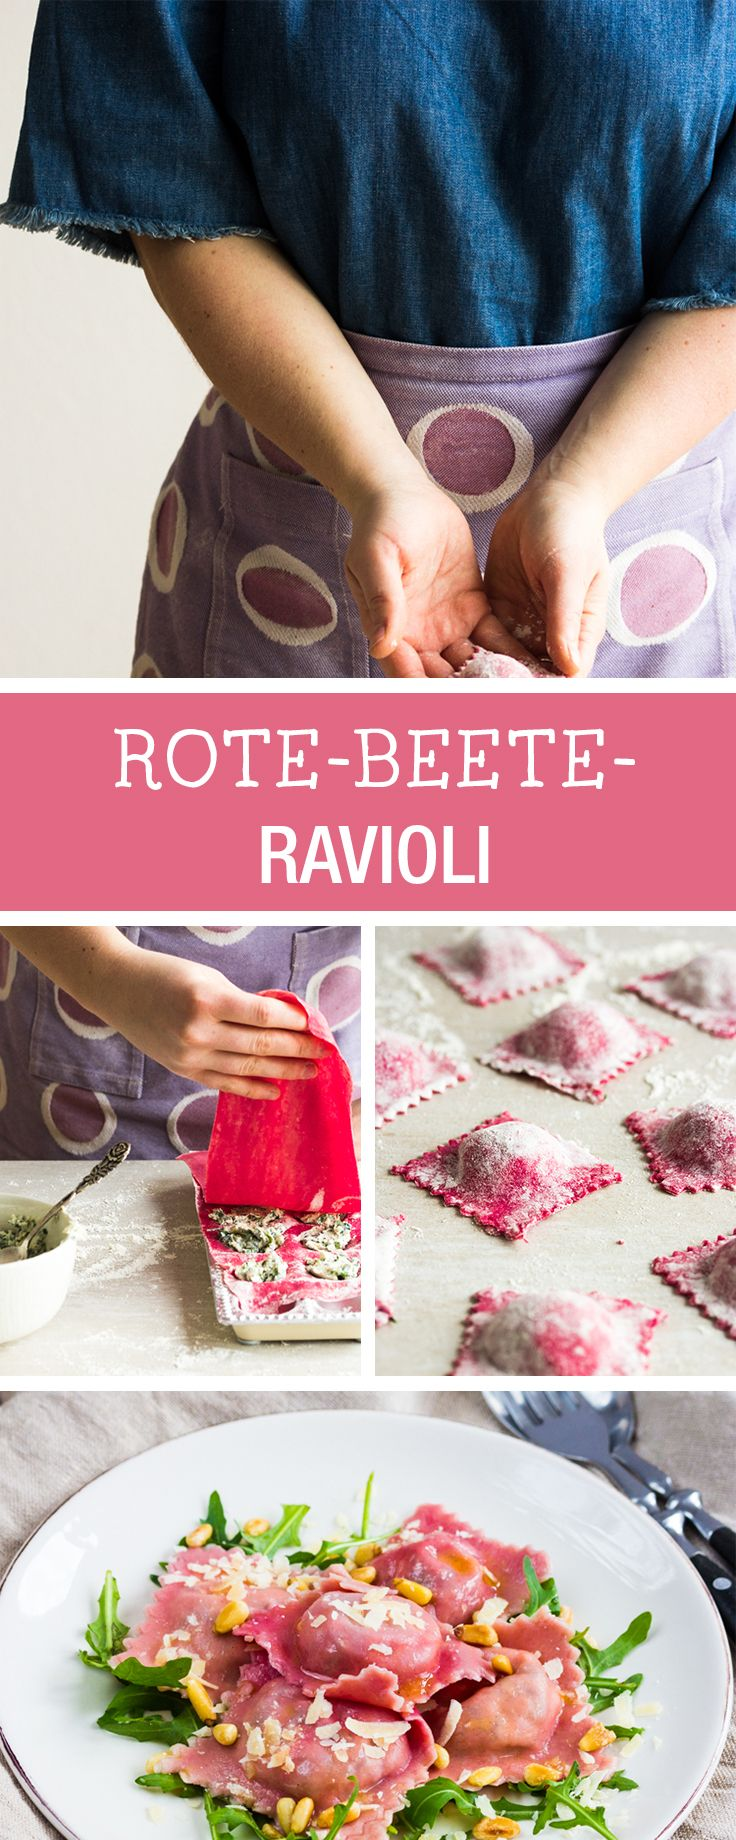 Leckere Herbstküche: Ravioli aus Rote Beete mit Füllung aus Ziegenkäse / fall recipes: homemade beetroot ravioli with goat cheese via DaWanda.com (Baking Pasta Recipes)